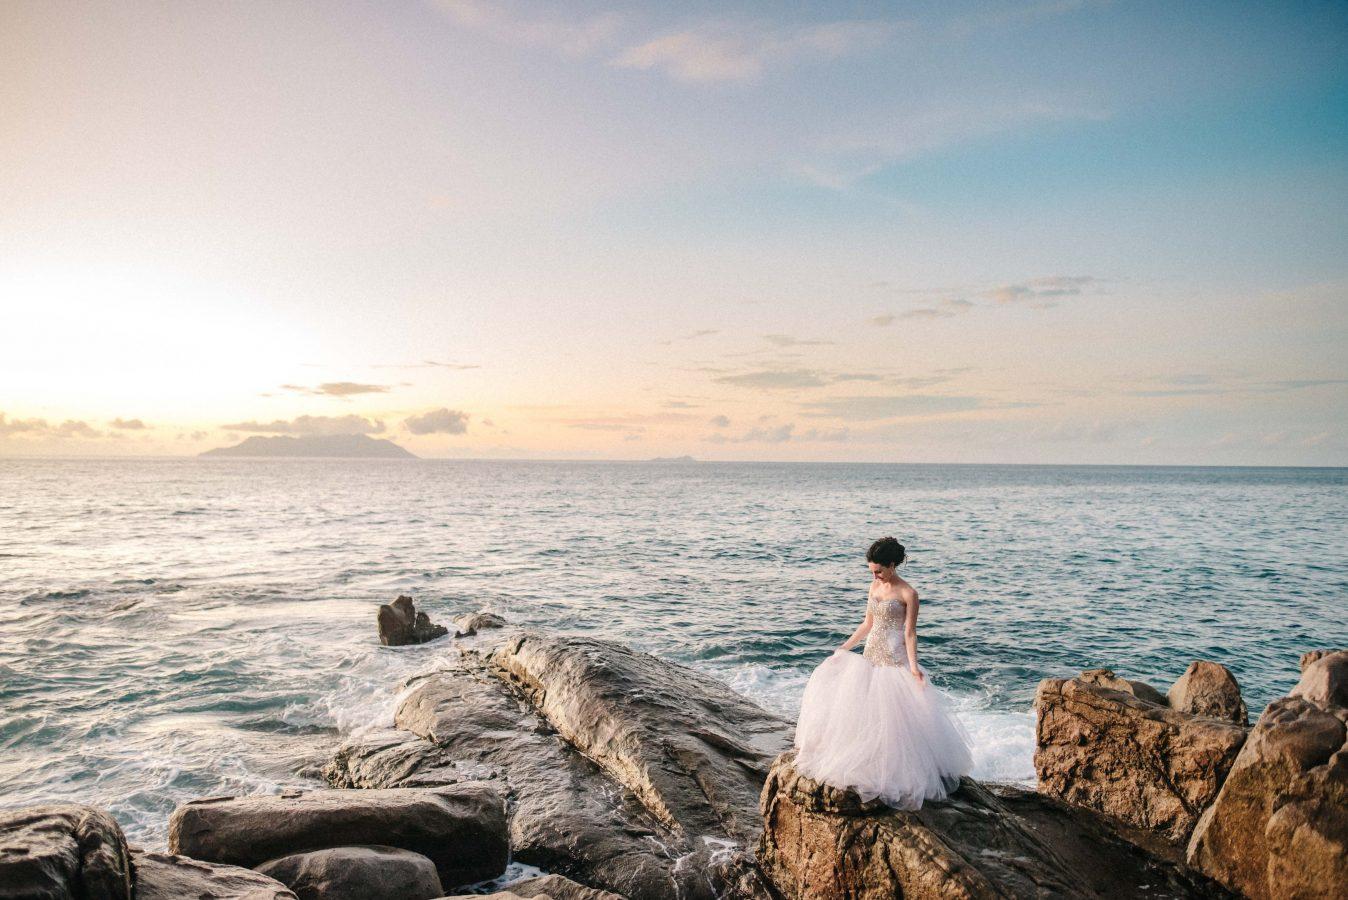 Fotos HochzeitsreportagenFotosirina rene 251115 web reportage 172